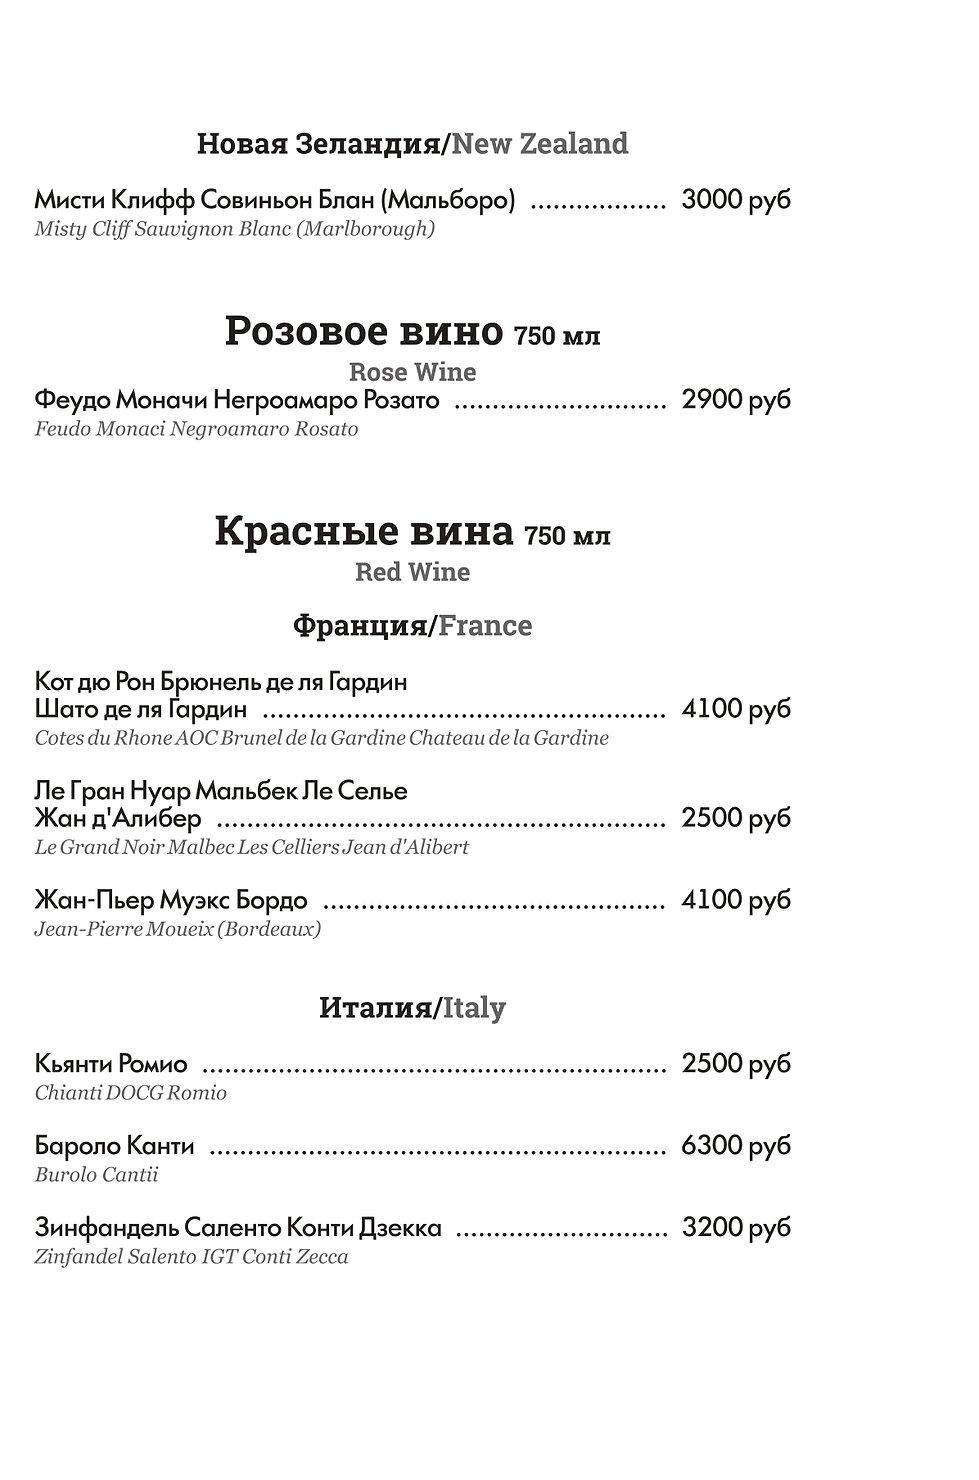 S46_bar_2021_ (2)_page-0004.jpg